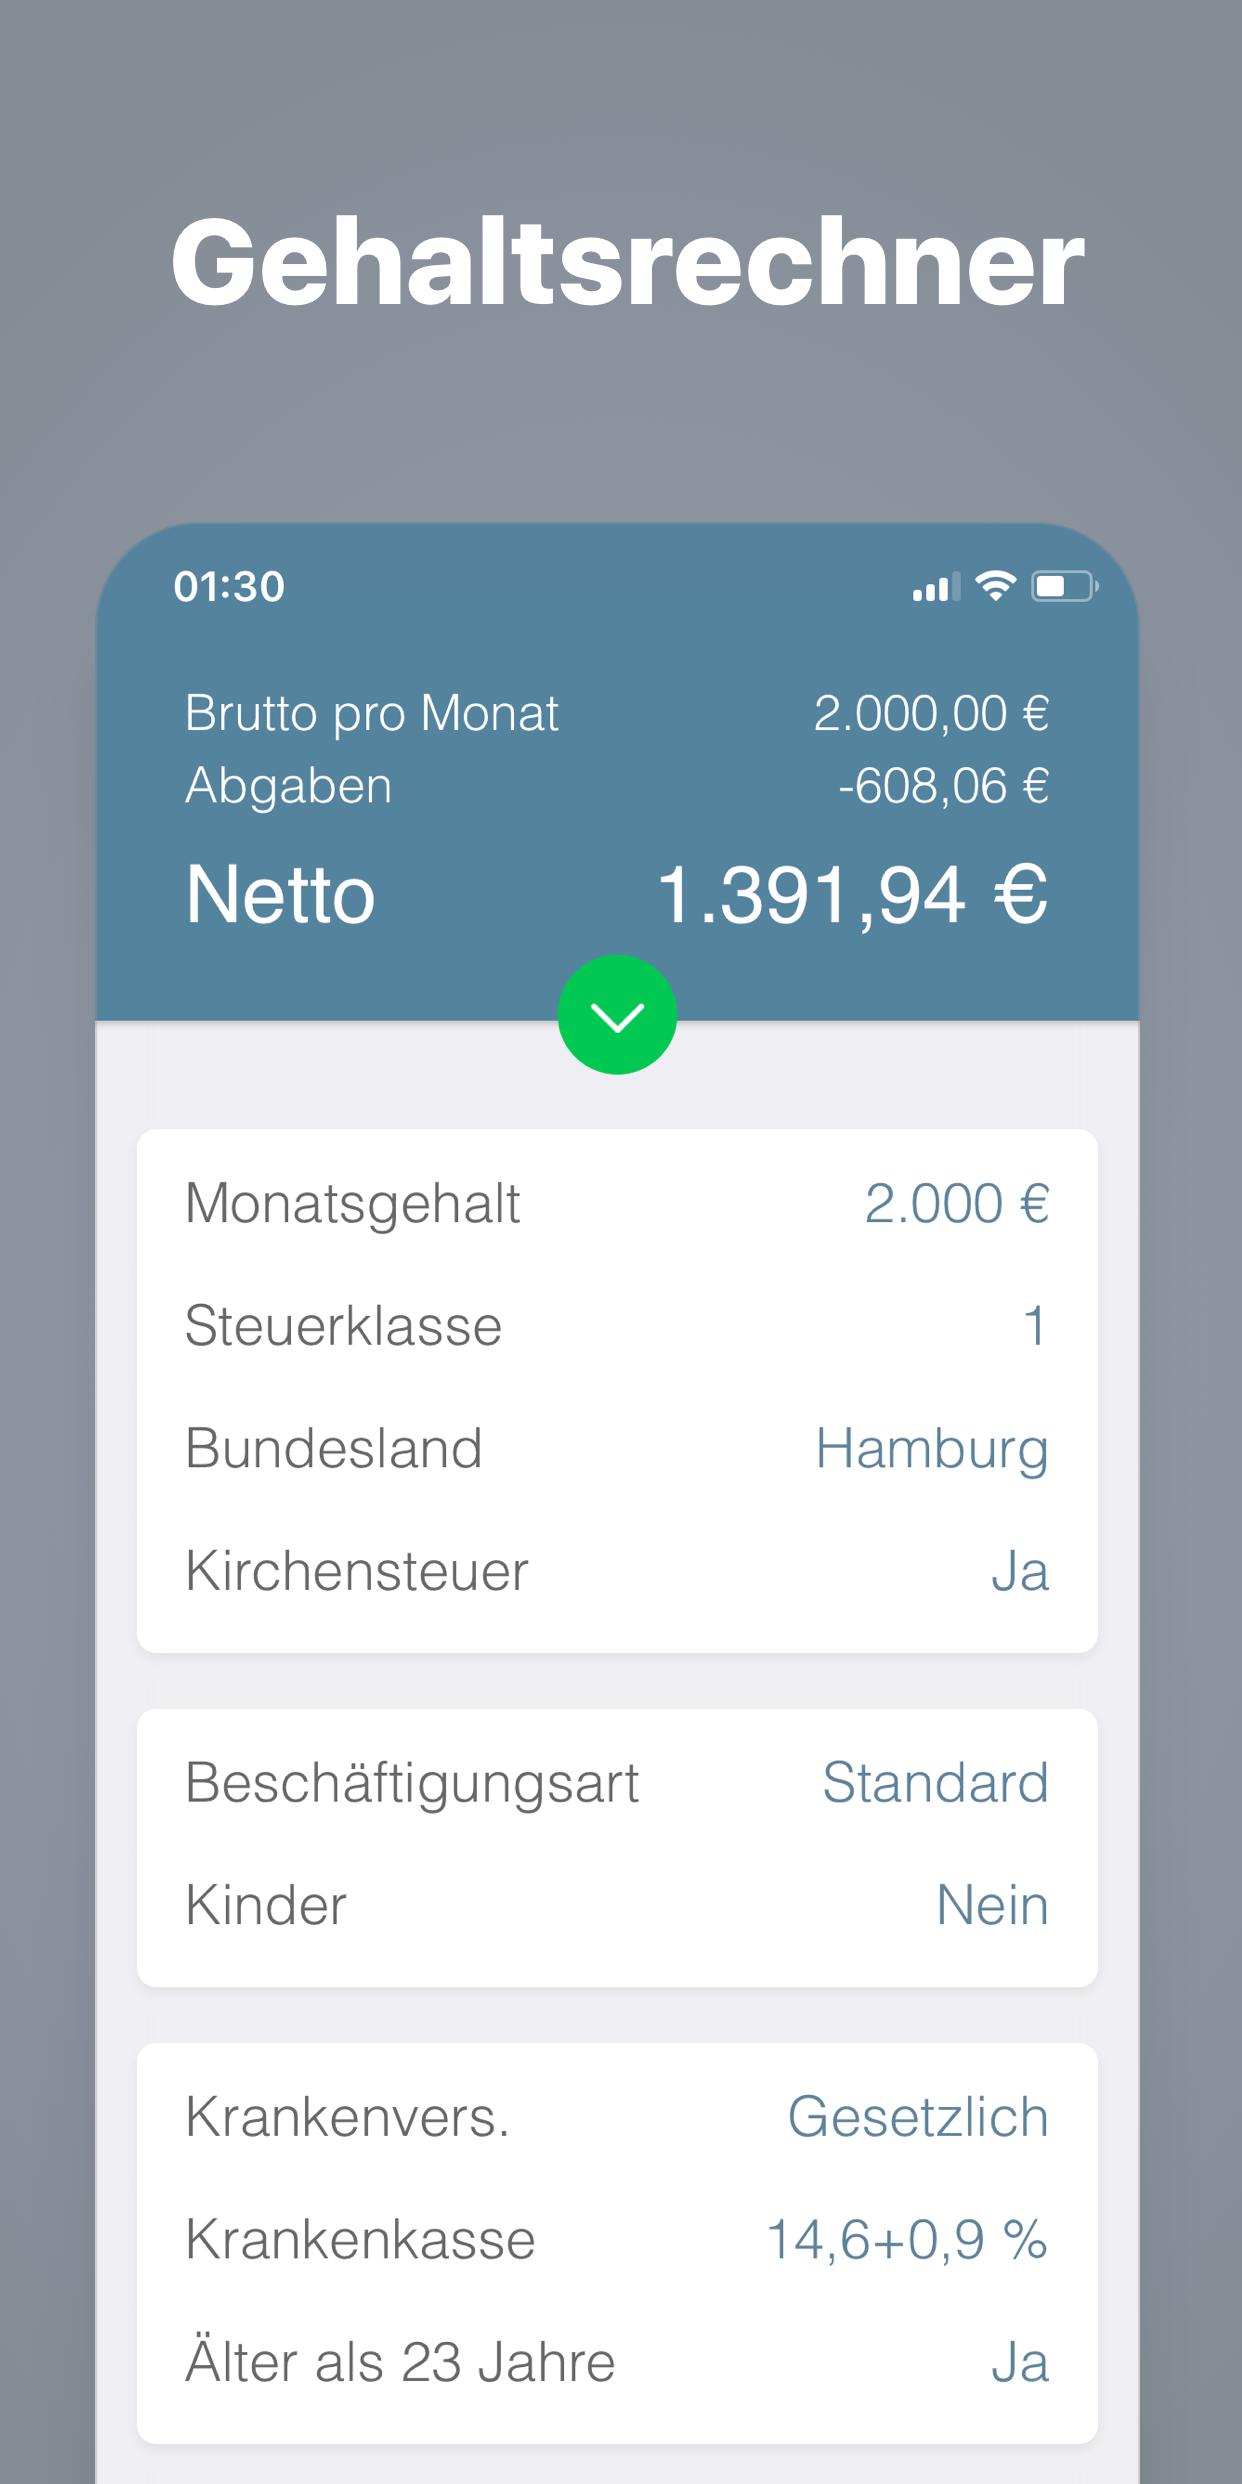 Bruno - Brutto Netto Rechner 2021 APK 2.5.4 Download for ...